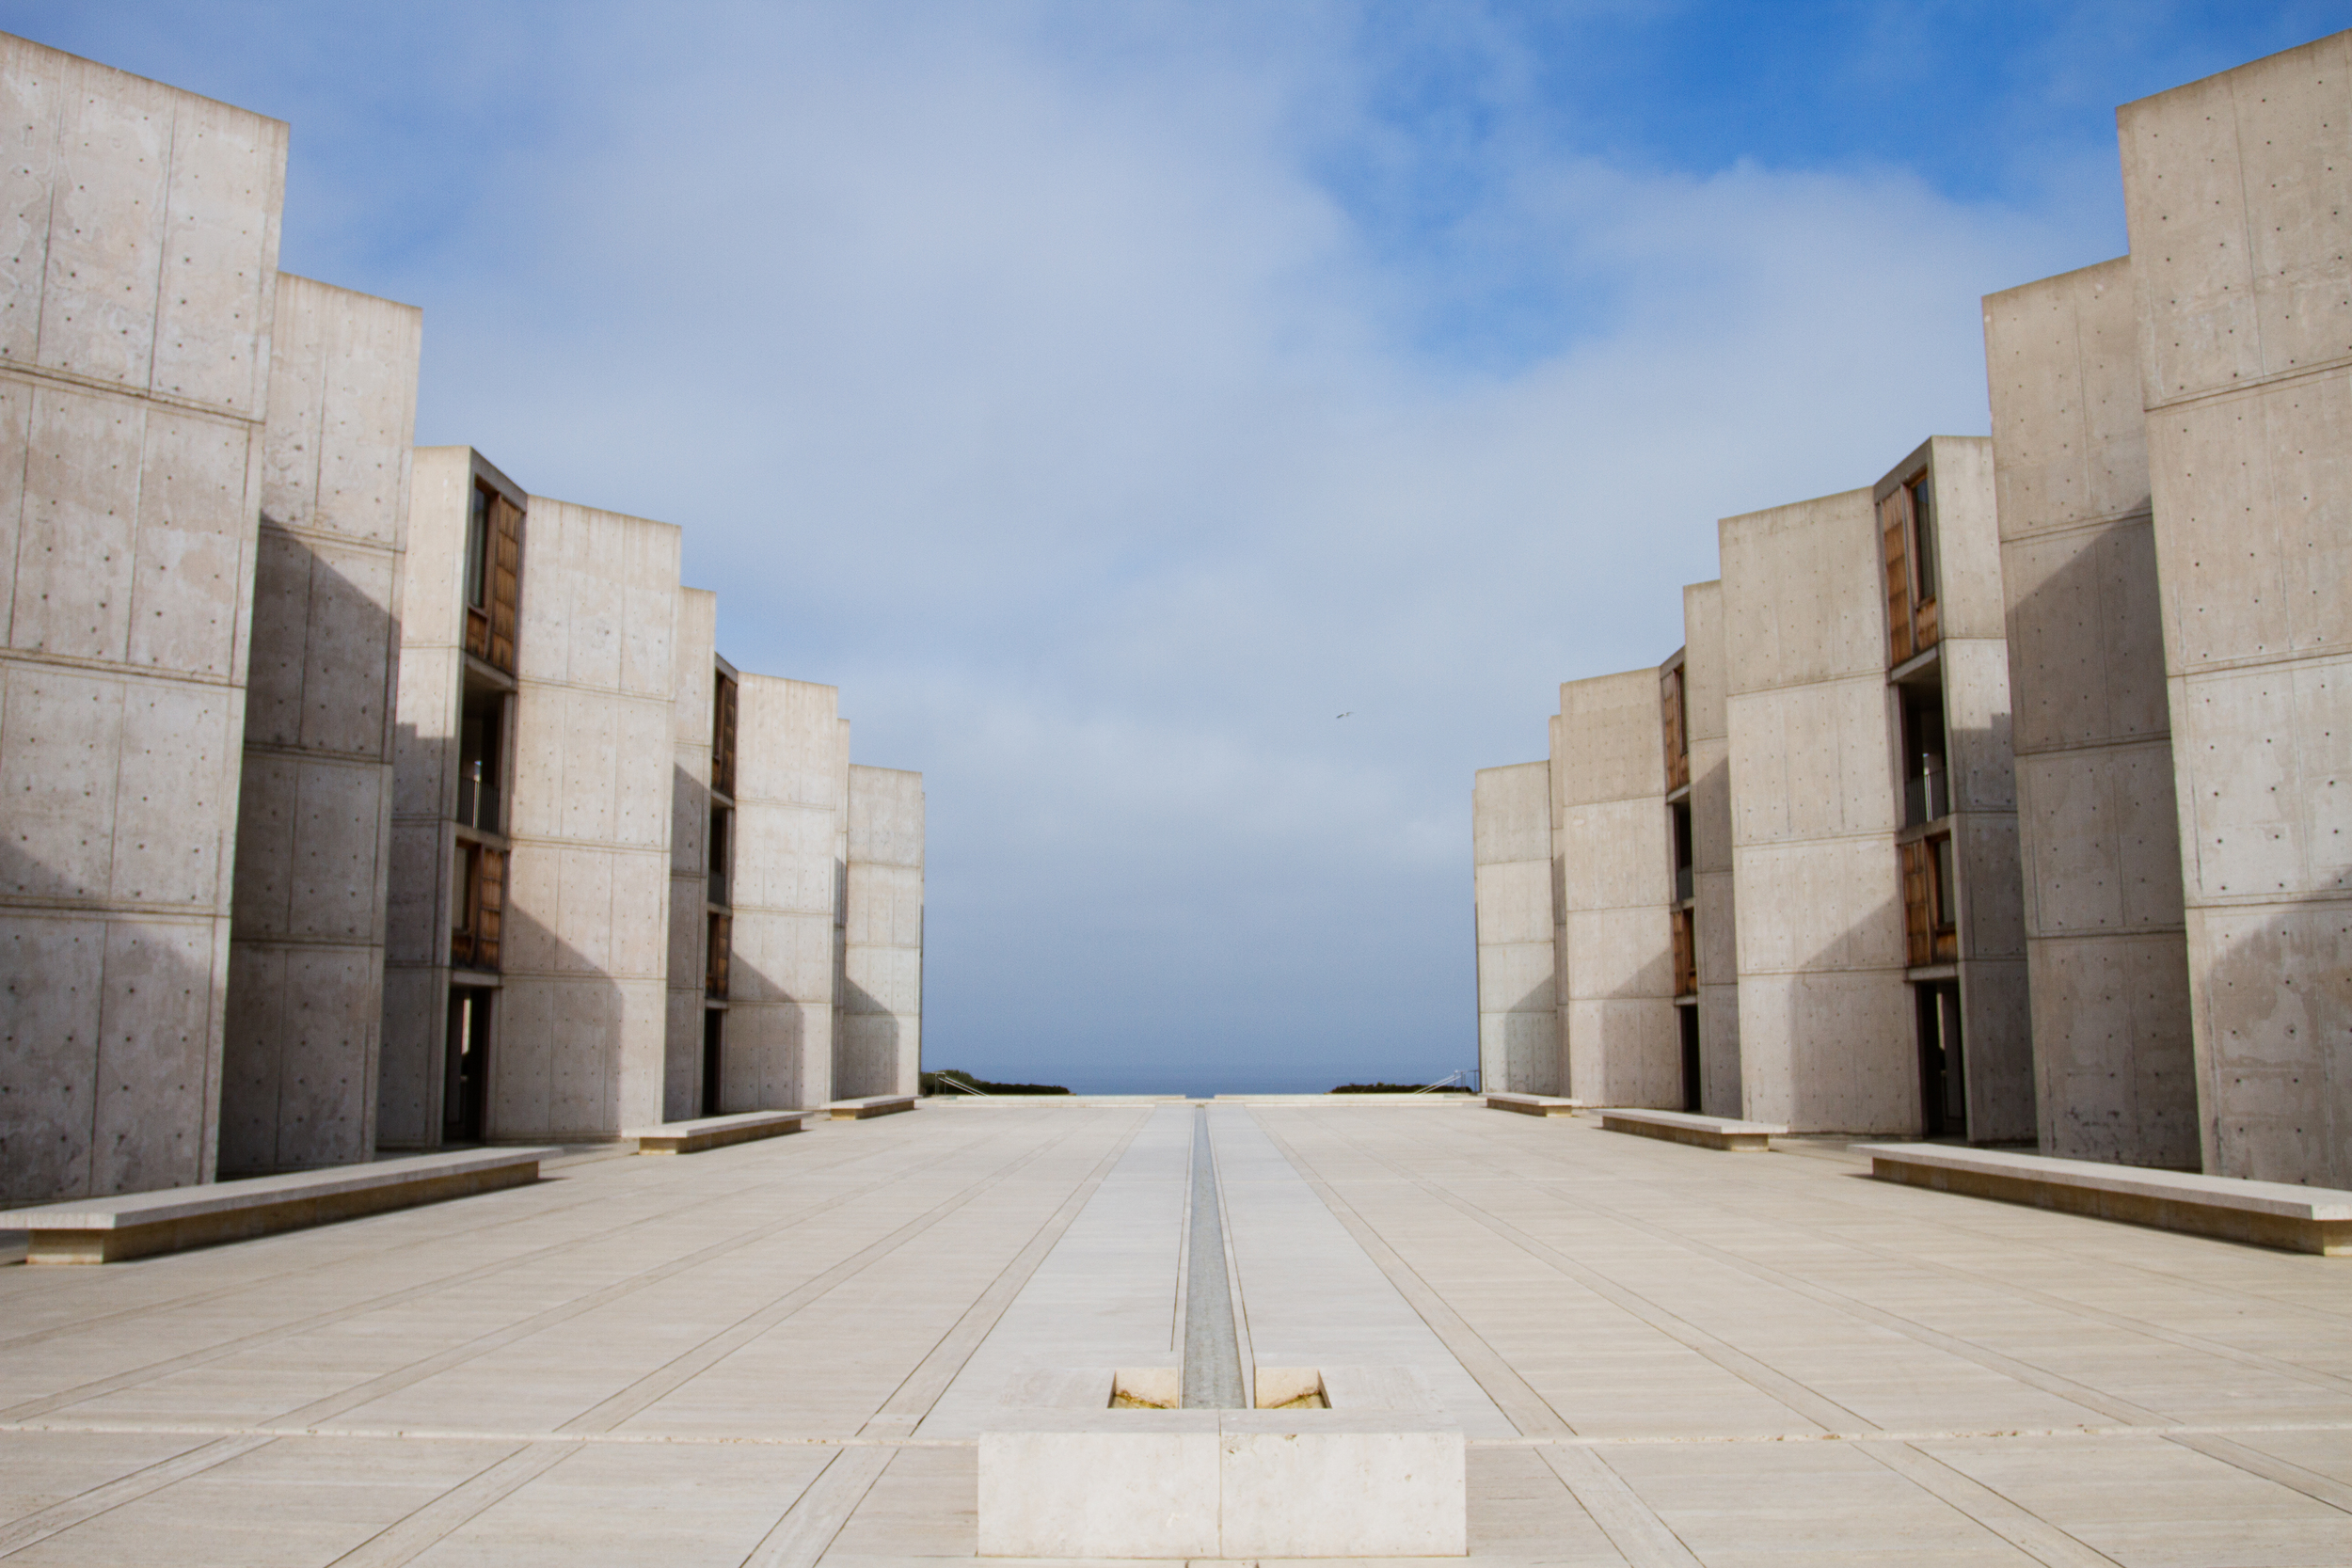 Salk Institute. Image credit: MerFilm AS.